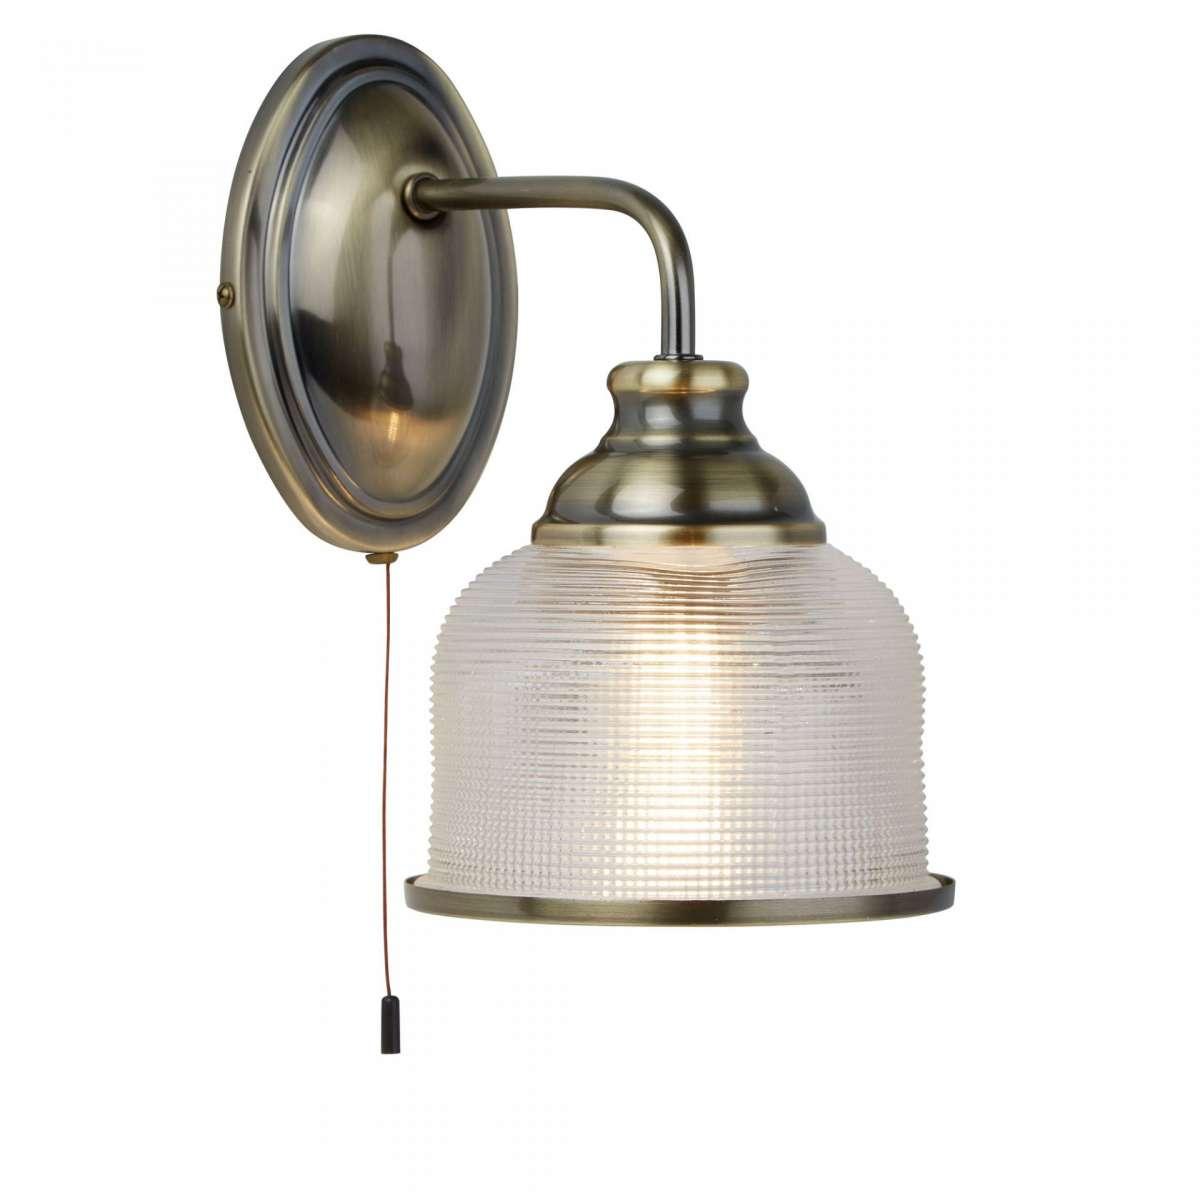 Bistro II 1 Light Wall Bracket Antique Brass With Halophane Glass